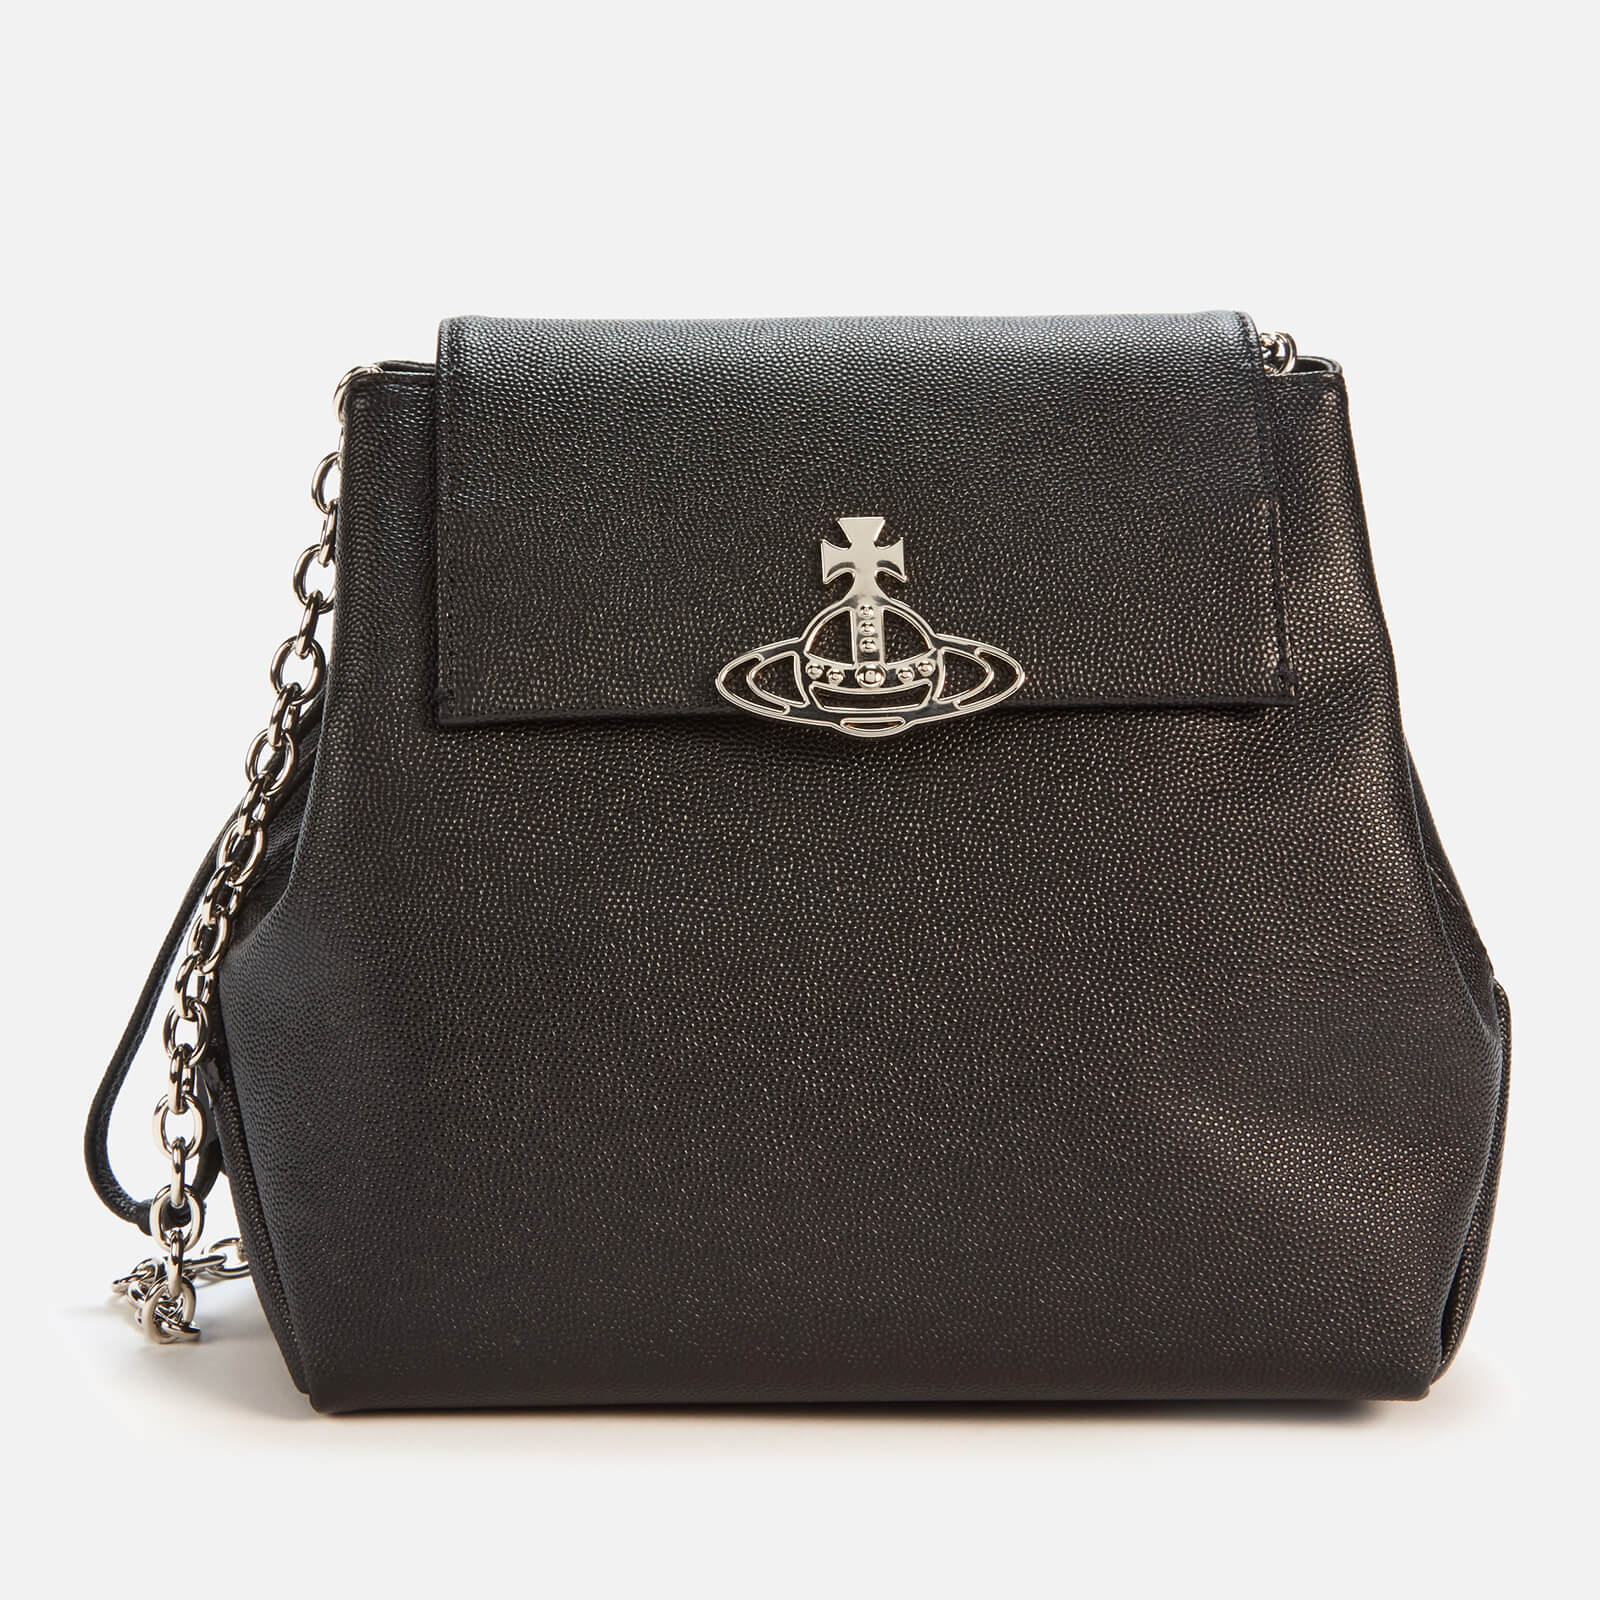 Vivienne Westwood Women's Windsor Bucket Bag - Black